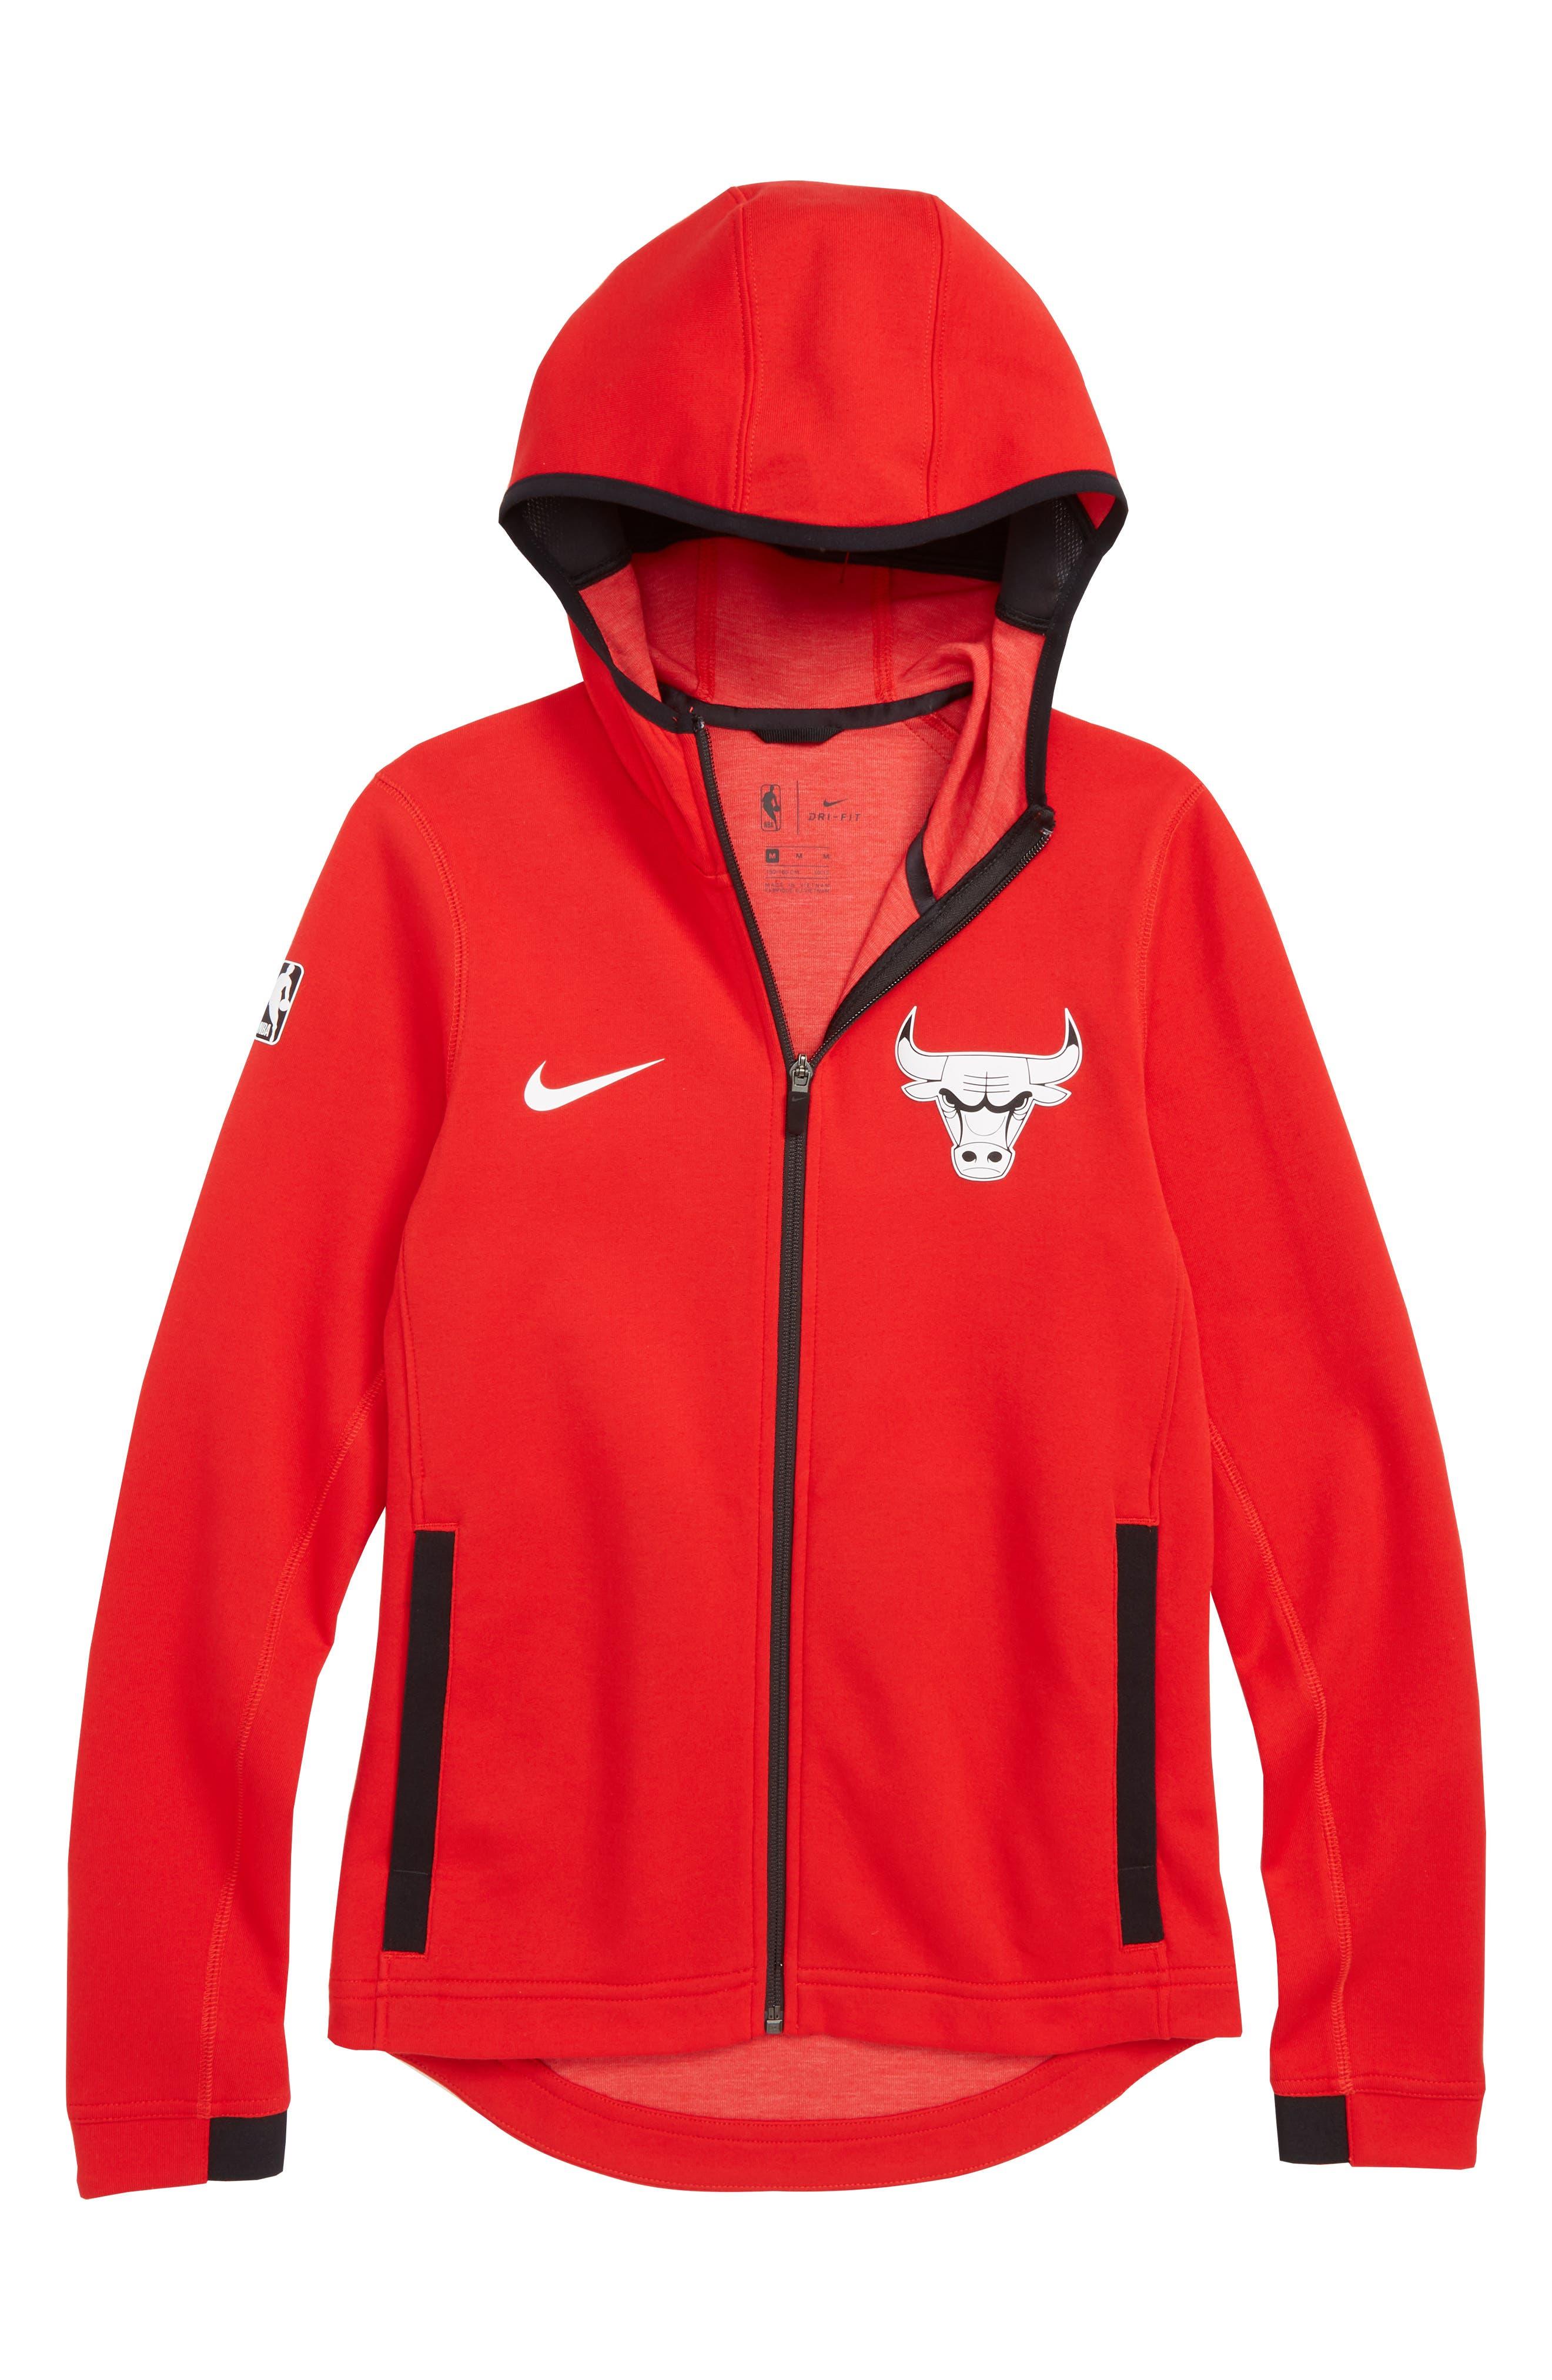 Chicago Bulls Showtime Dri-FIT Zip Hoodie,                             Main thumbnail 1, color,                             UNIVERSITY RED